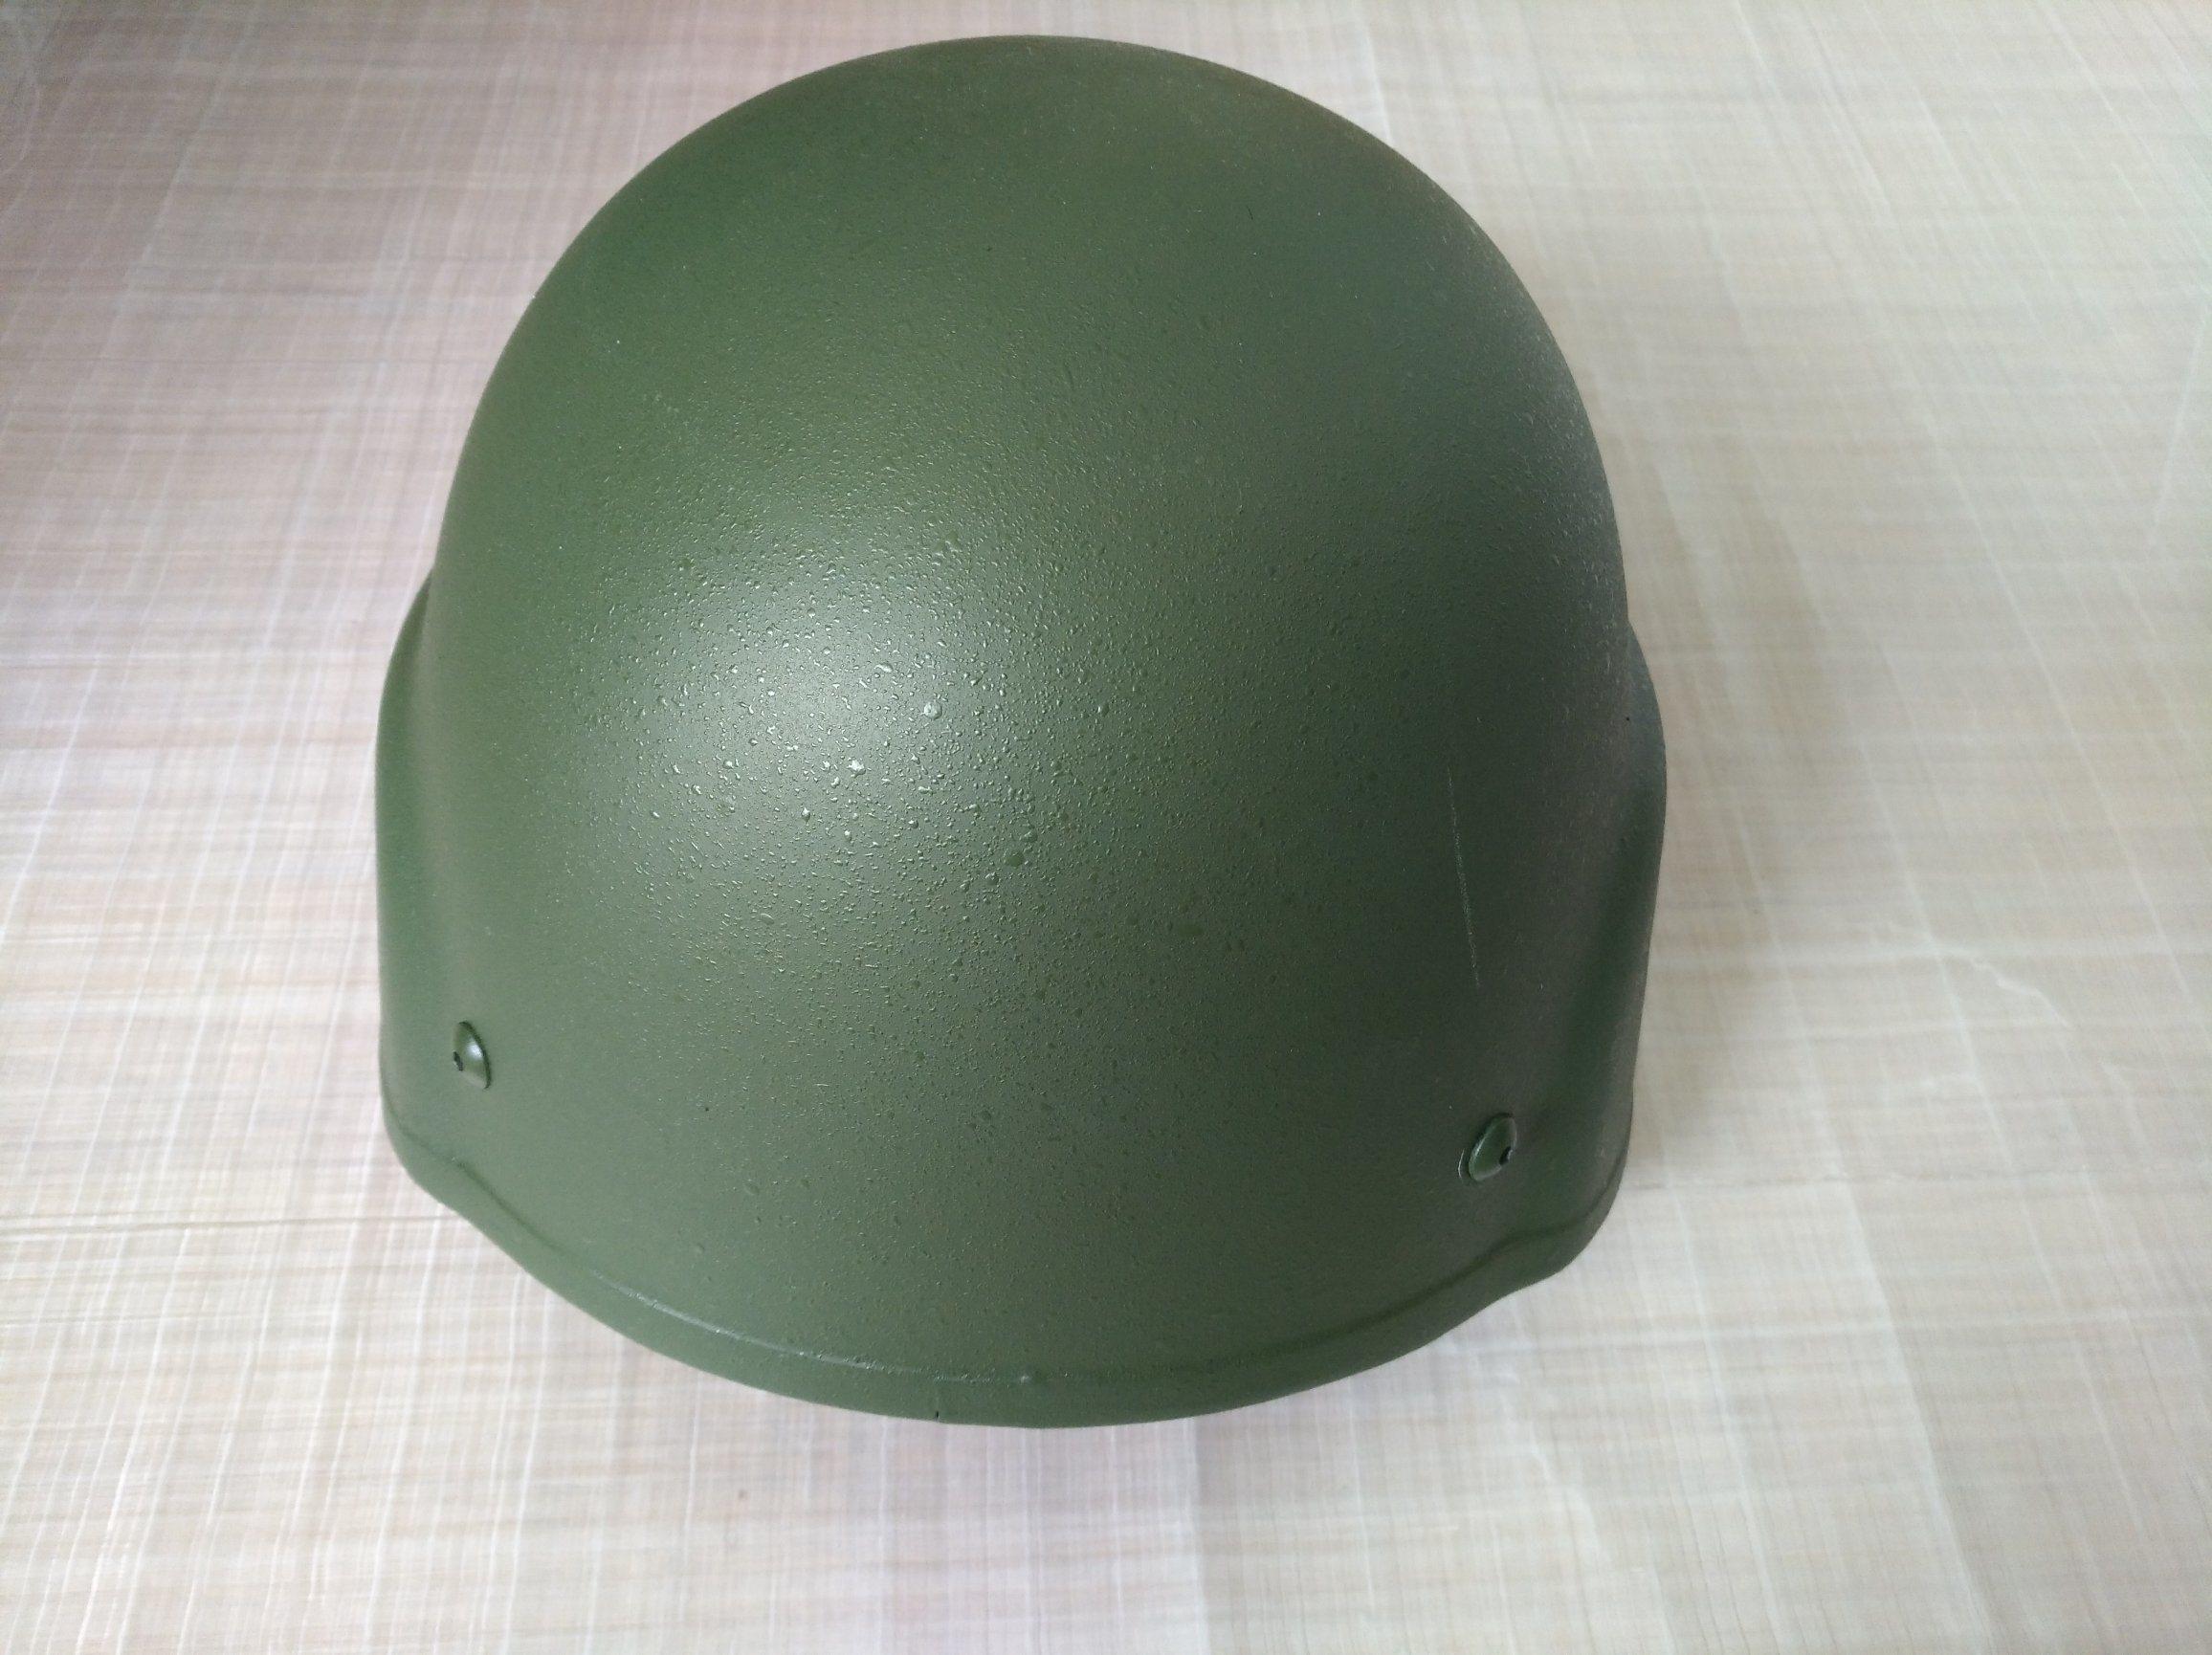 e5c723d0 China Nij Lever Iiia UHMWPE Bulletproof Helmet with Visor Photos ...